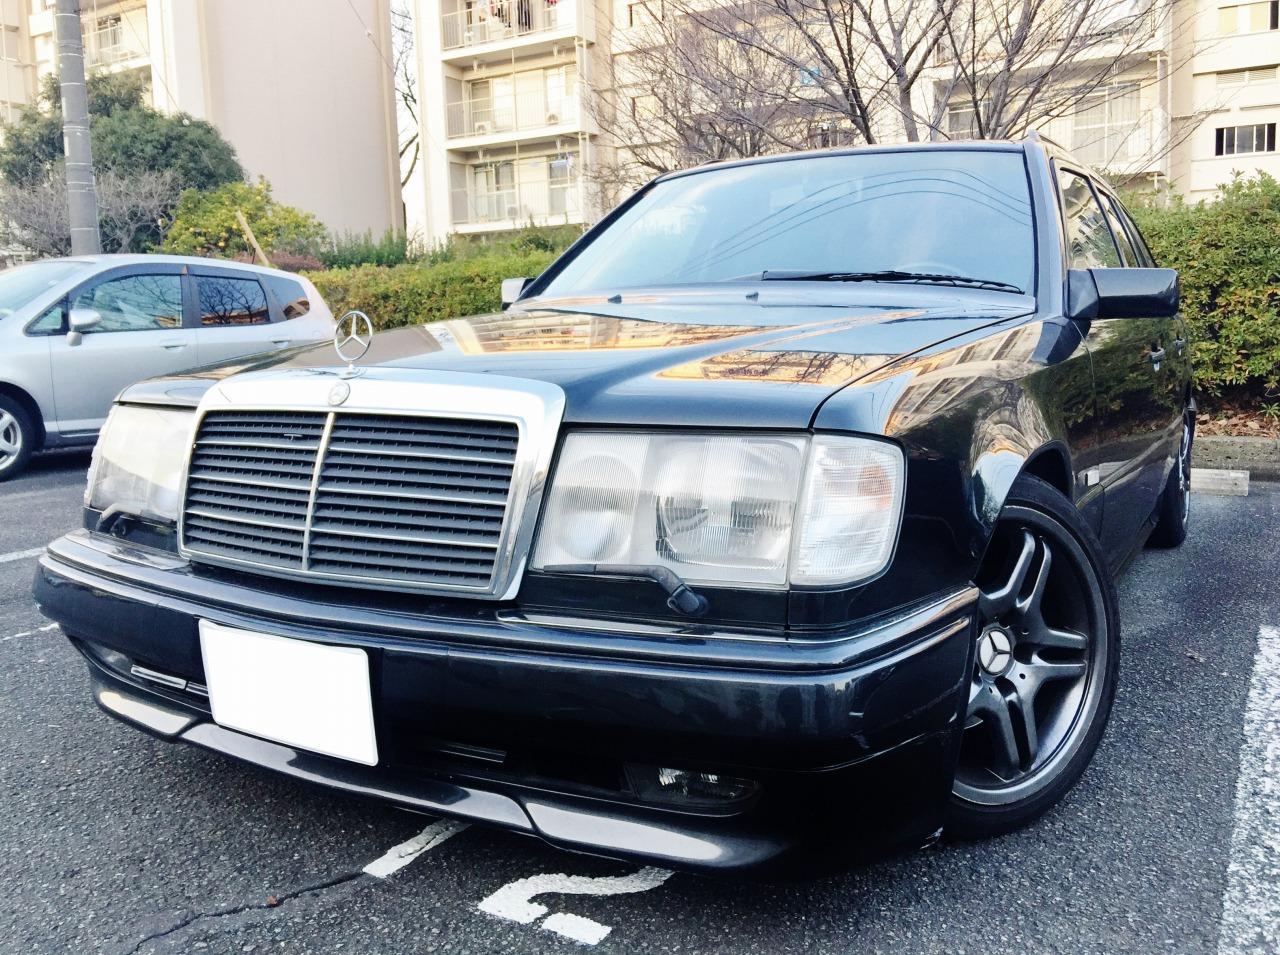 W124型メルセデスベンツ300TEの売却は藤沢・茅ヶ崎・平塚。逗子。鎌倉なら査定から即日現金買取り可能な湘南の車買取りハッピーカーズへ